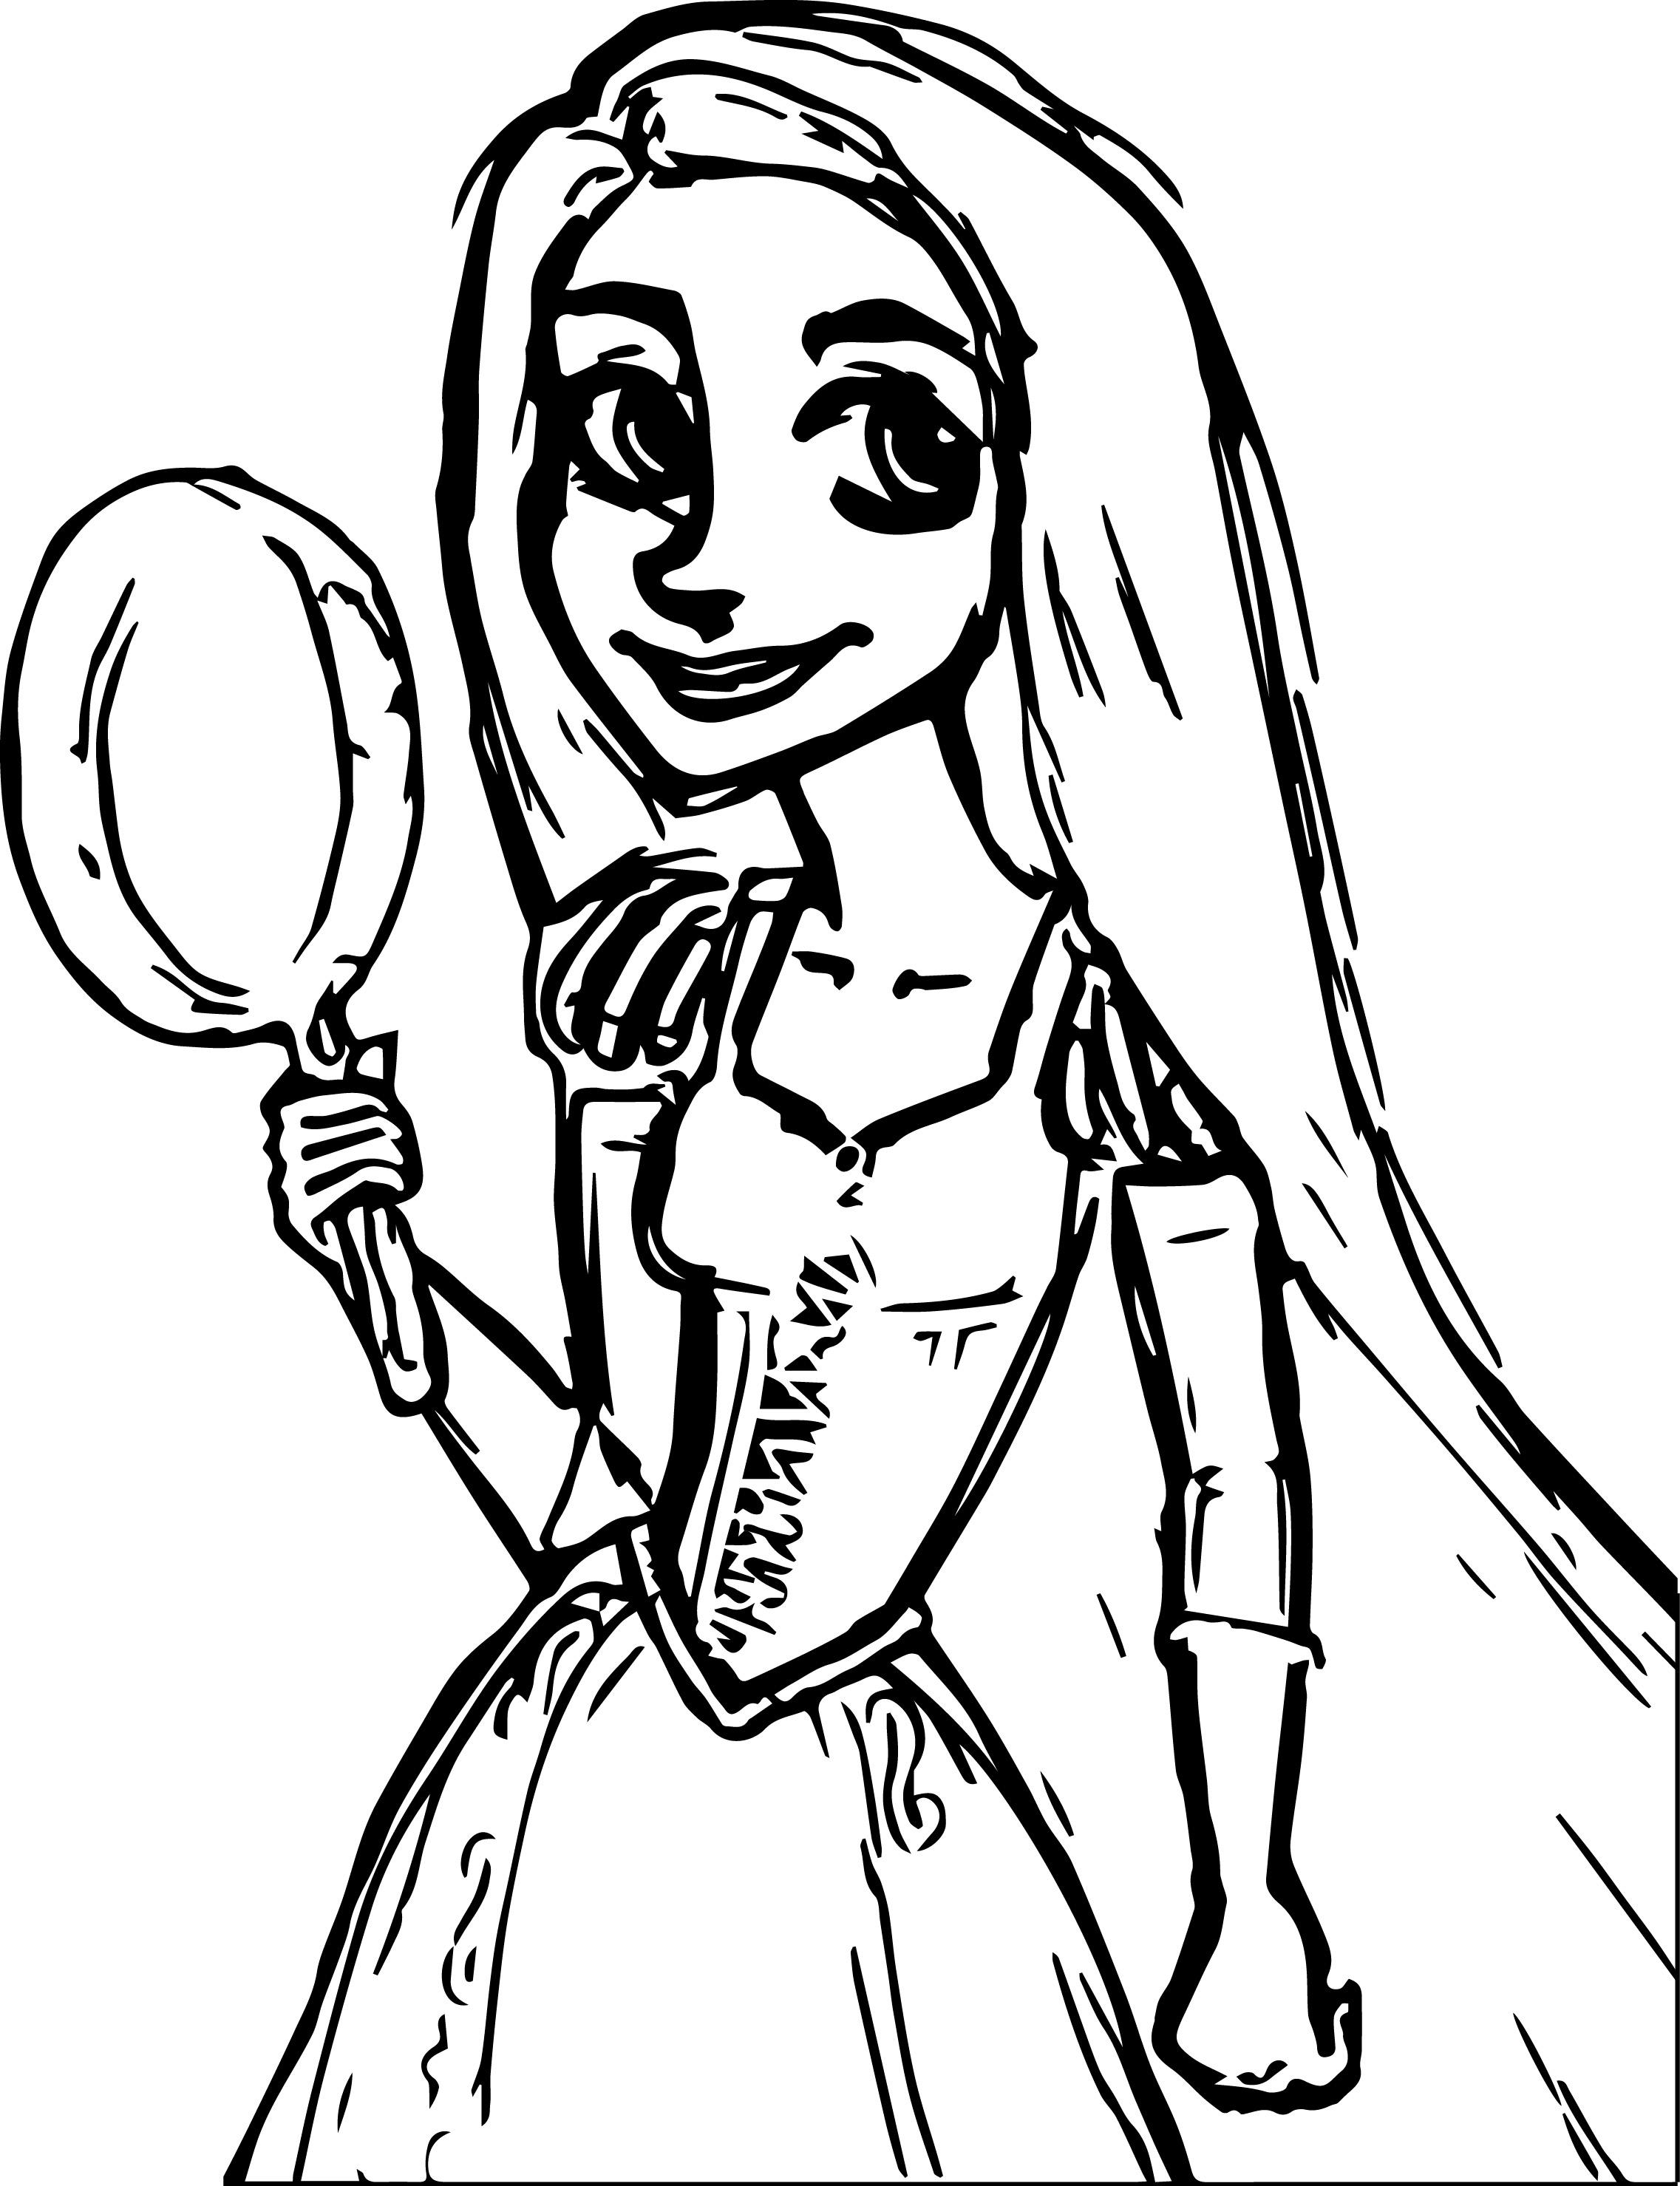 Rapunzel Pan Sketch Coloring Page